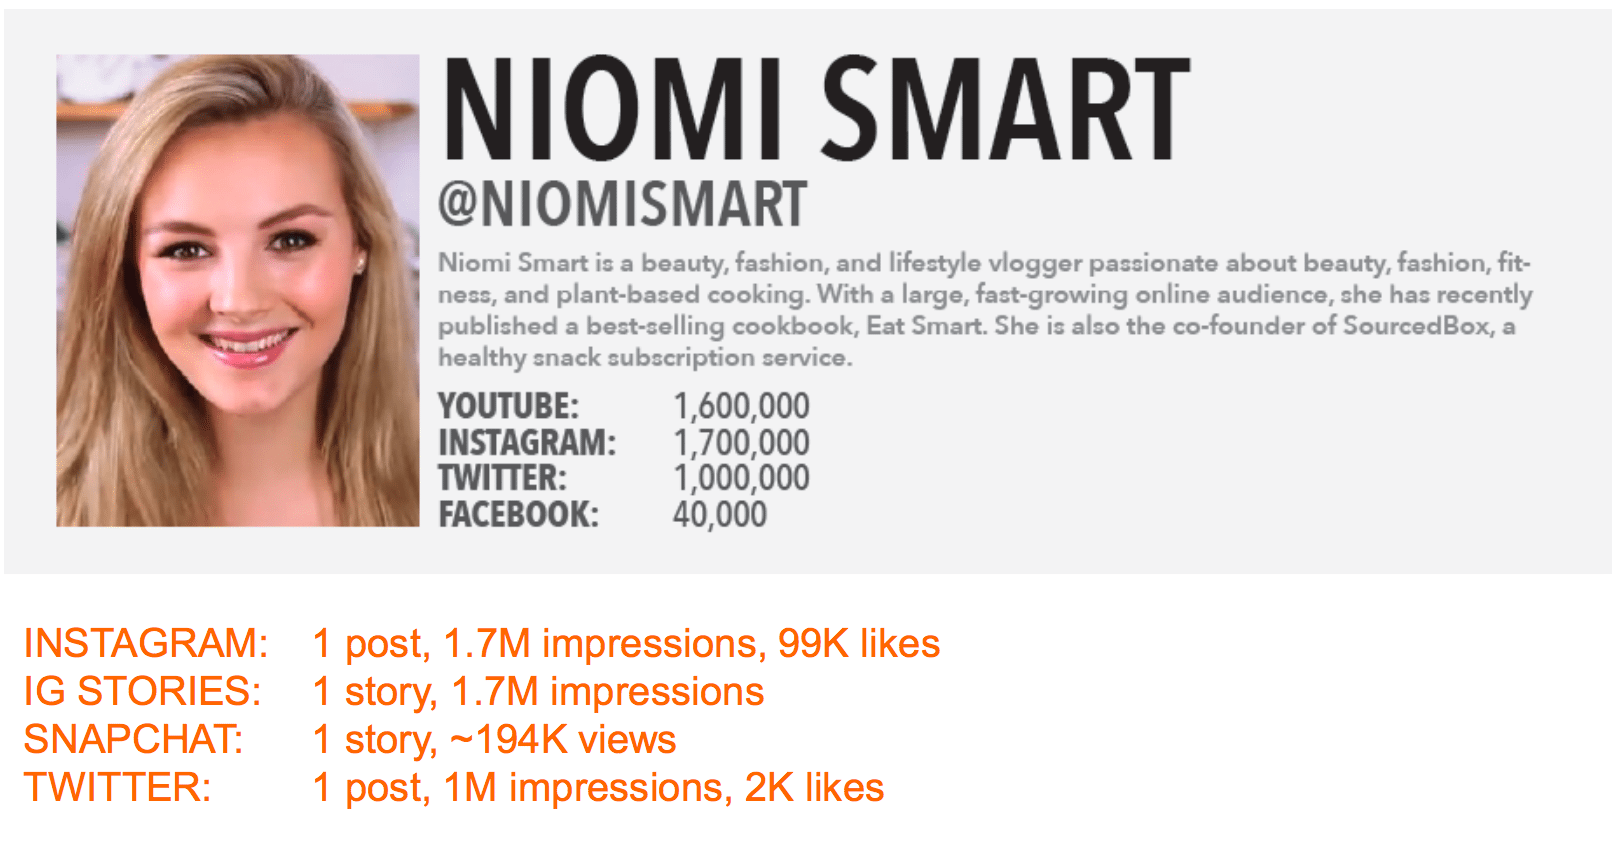 niomi smart, metrics, social